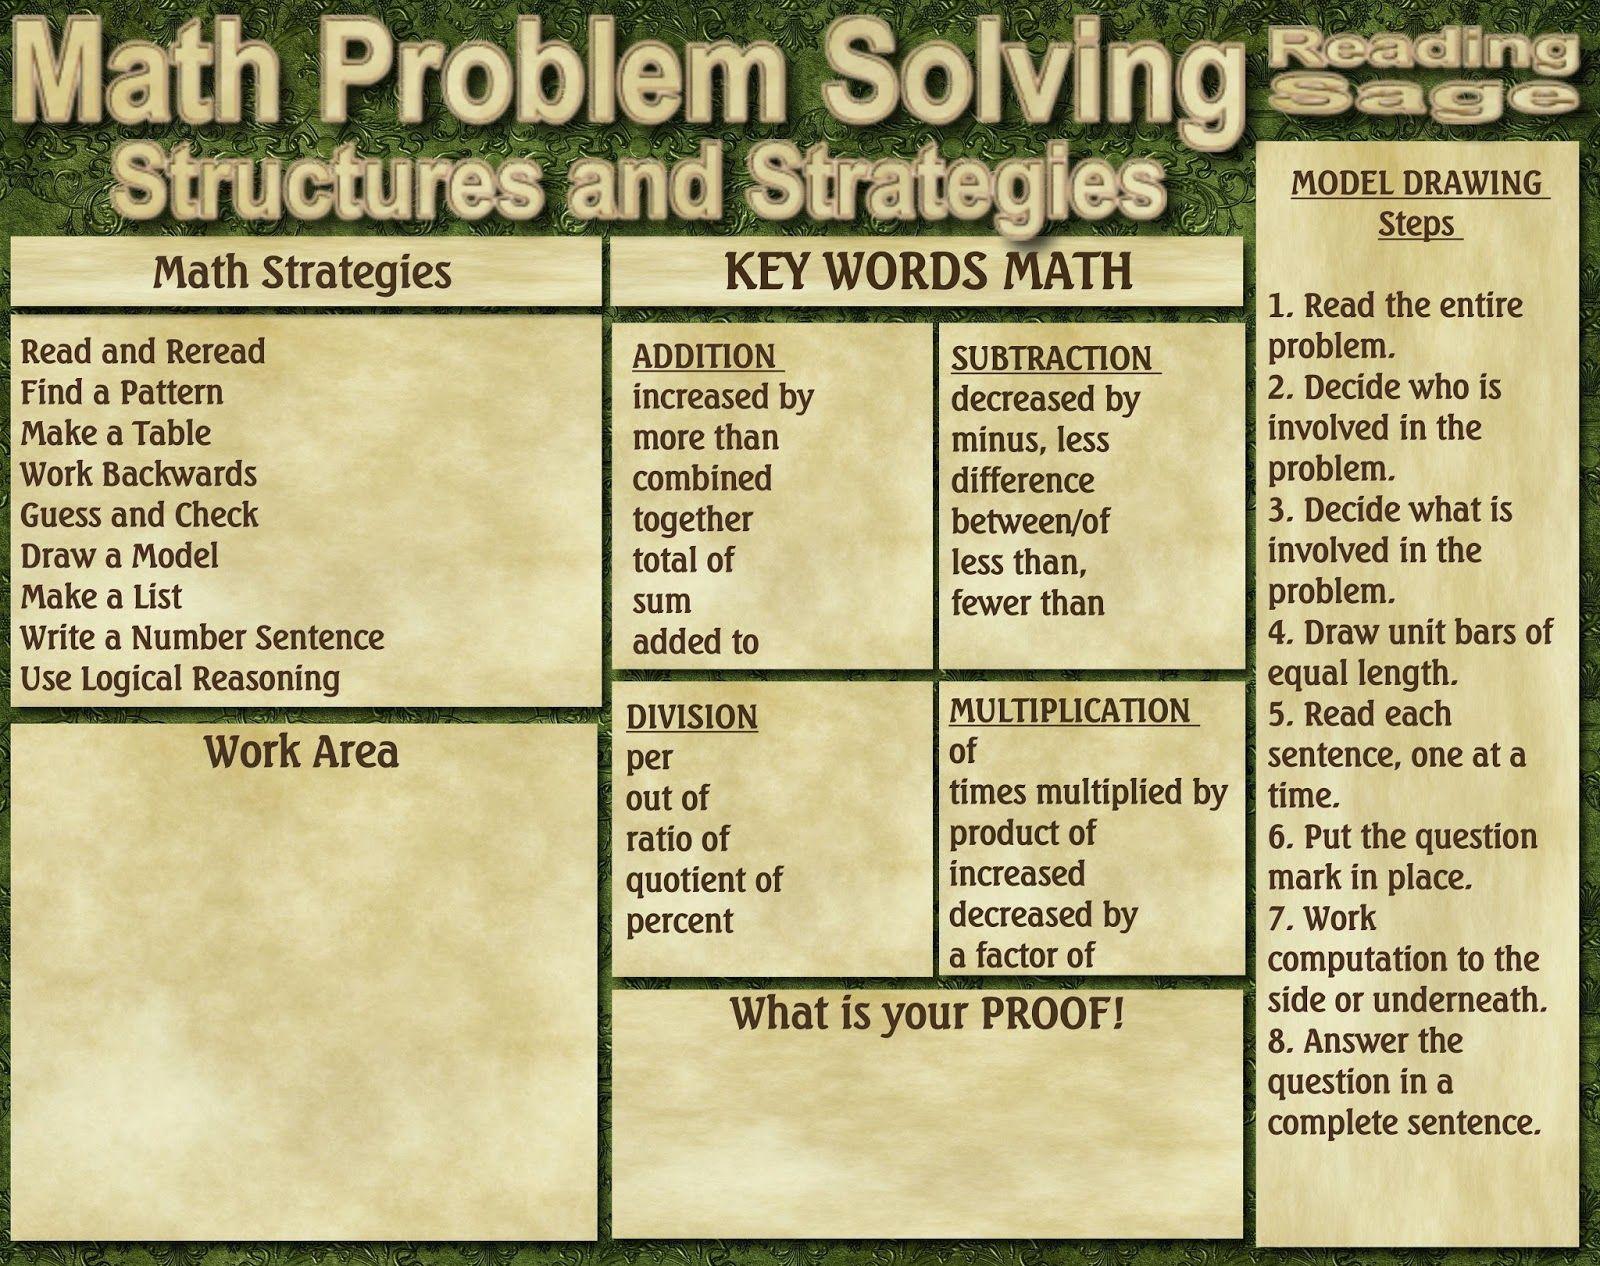 Reading Sage Math Practice Test Prep K 12 Sat Ged